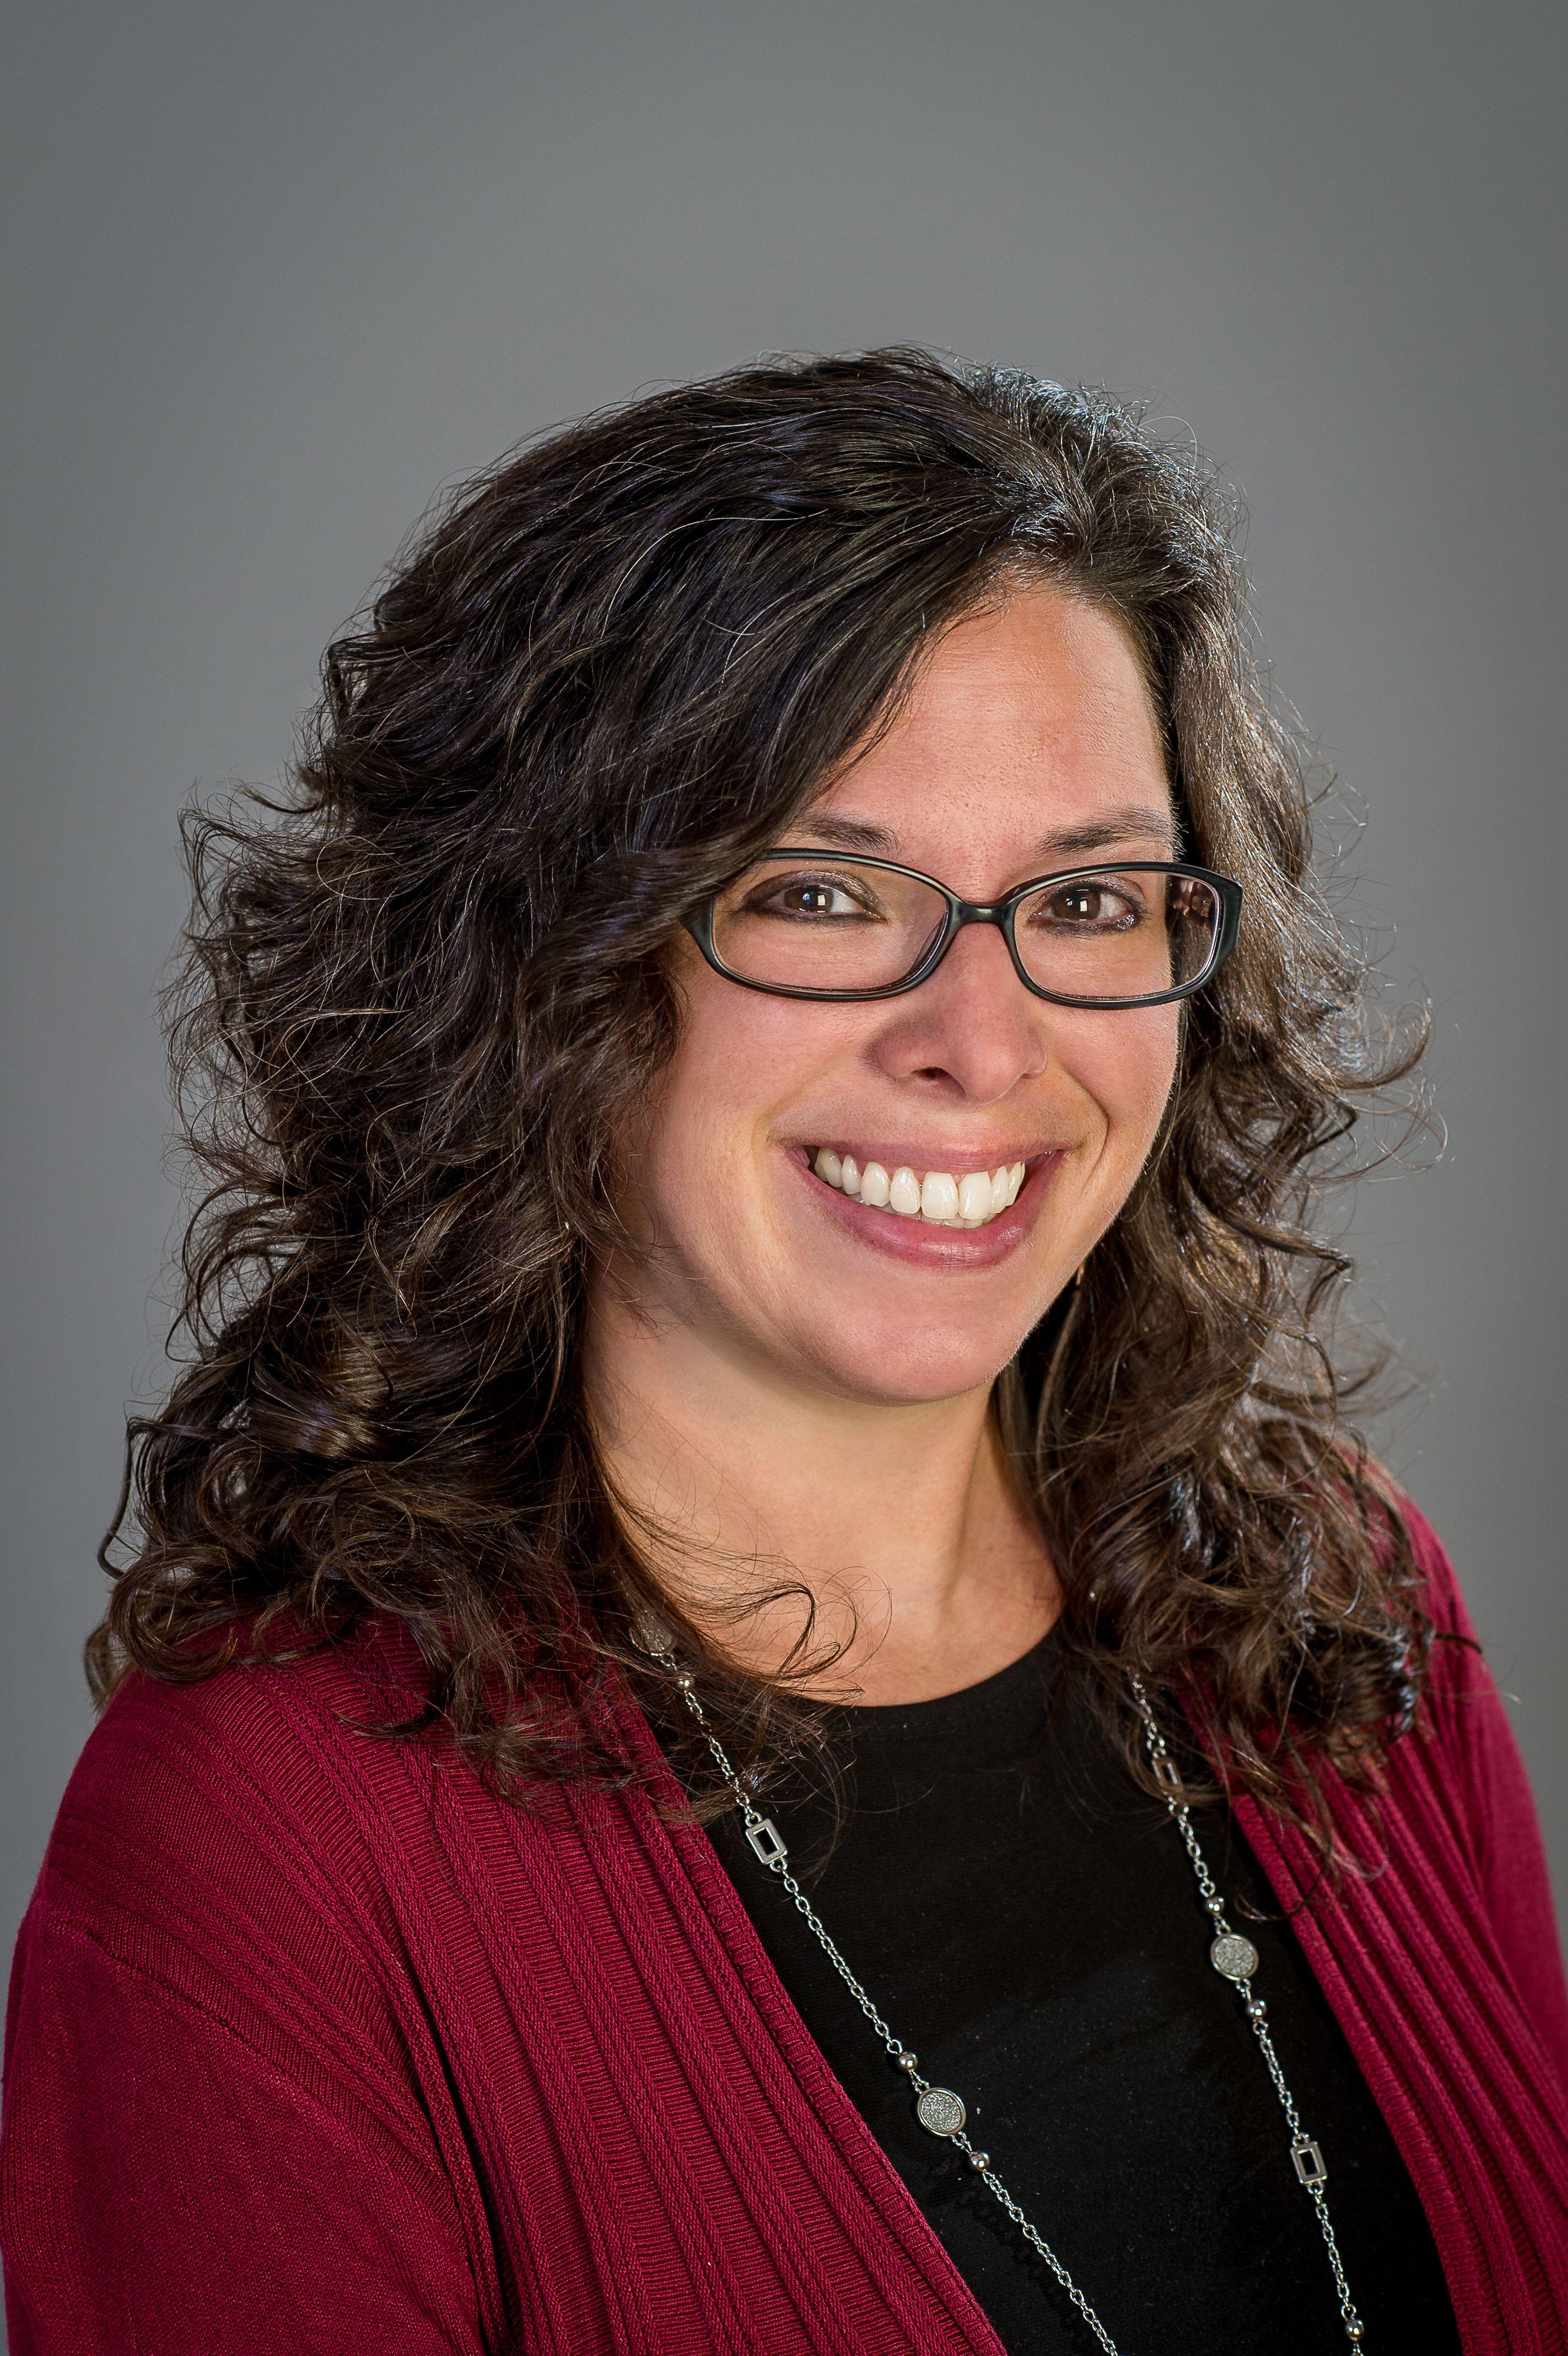 Cheryl Pallman